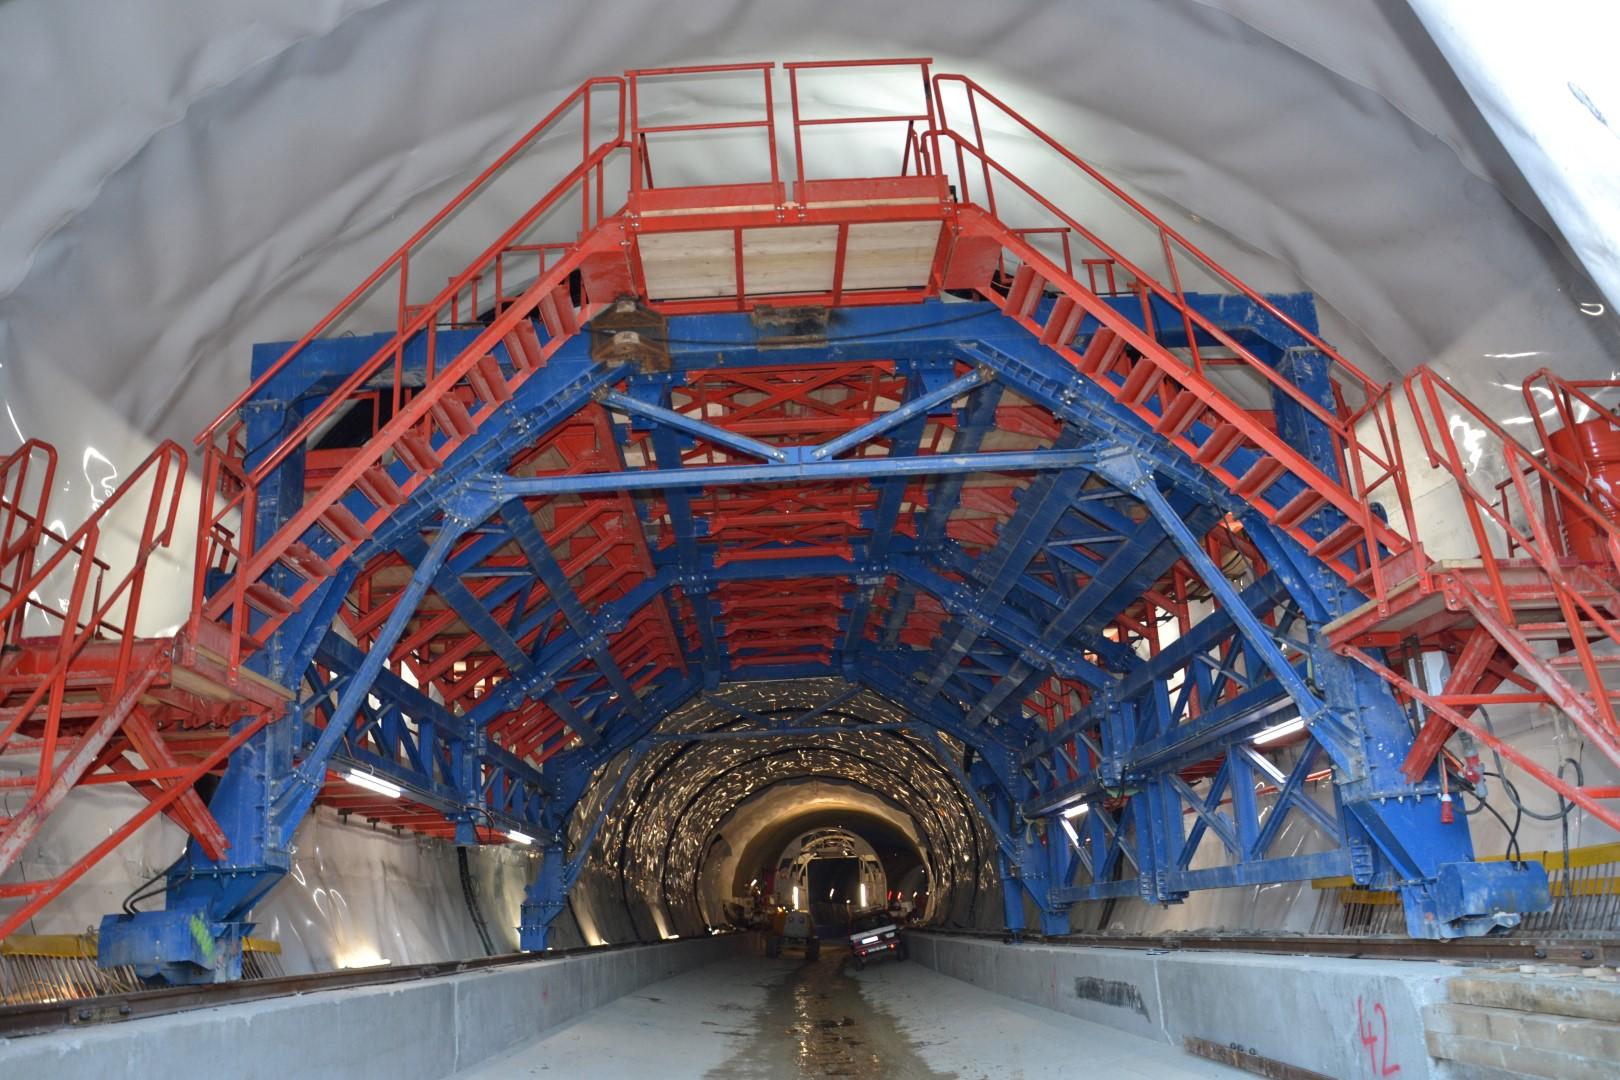 603152105-aubergtunnel-altenmarkt-februar-2019.jpg